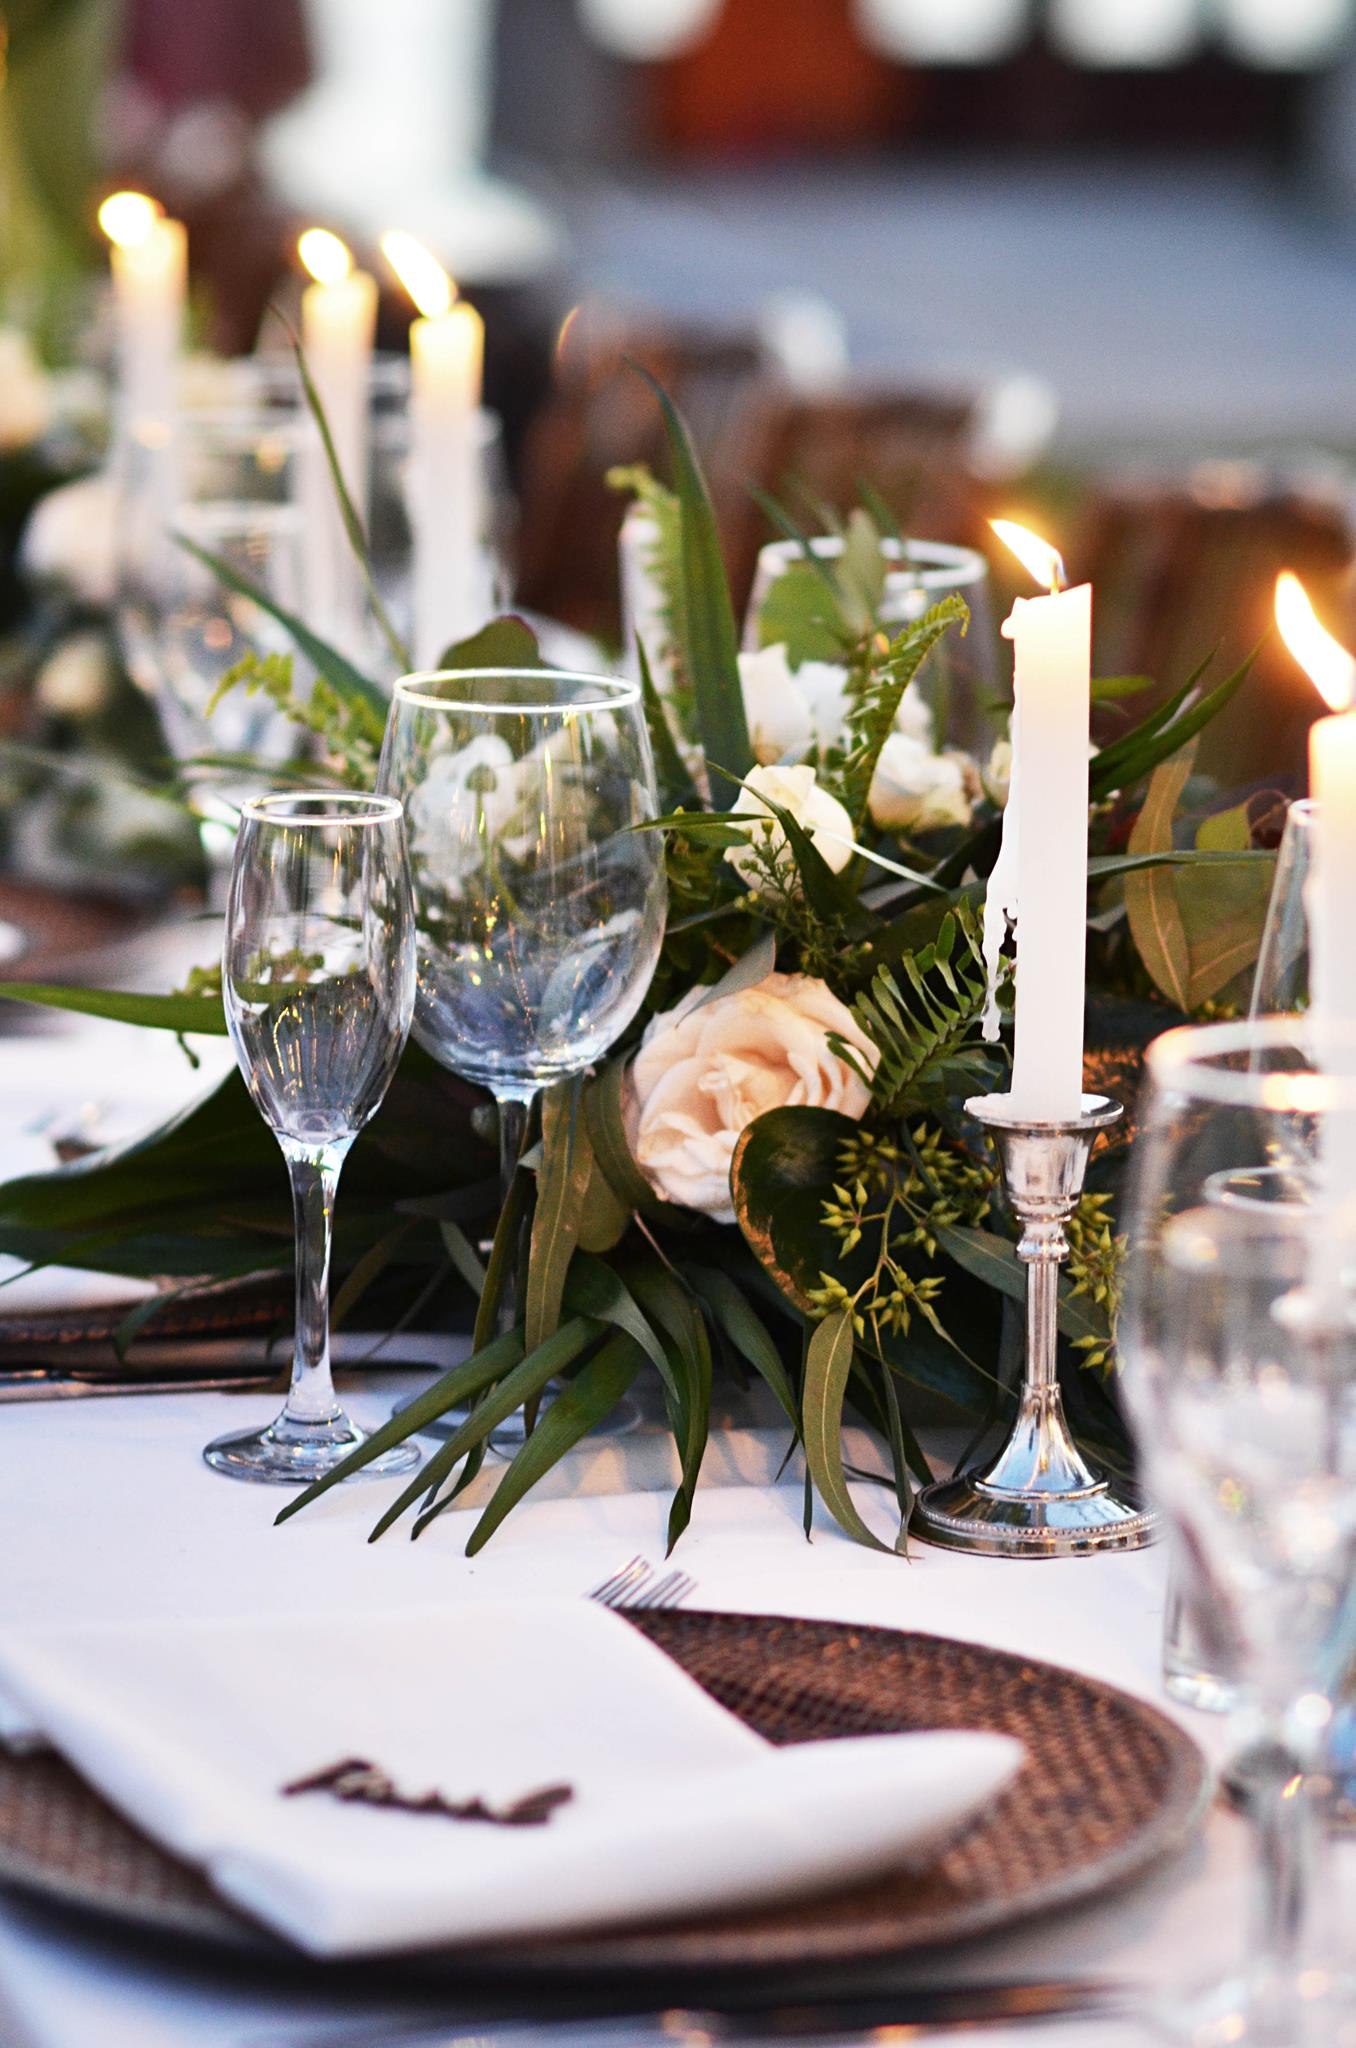 natural decor table settings classy yet subtle Nayarit Mexico wedding featured Inside Weddings Magazine